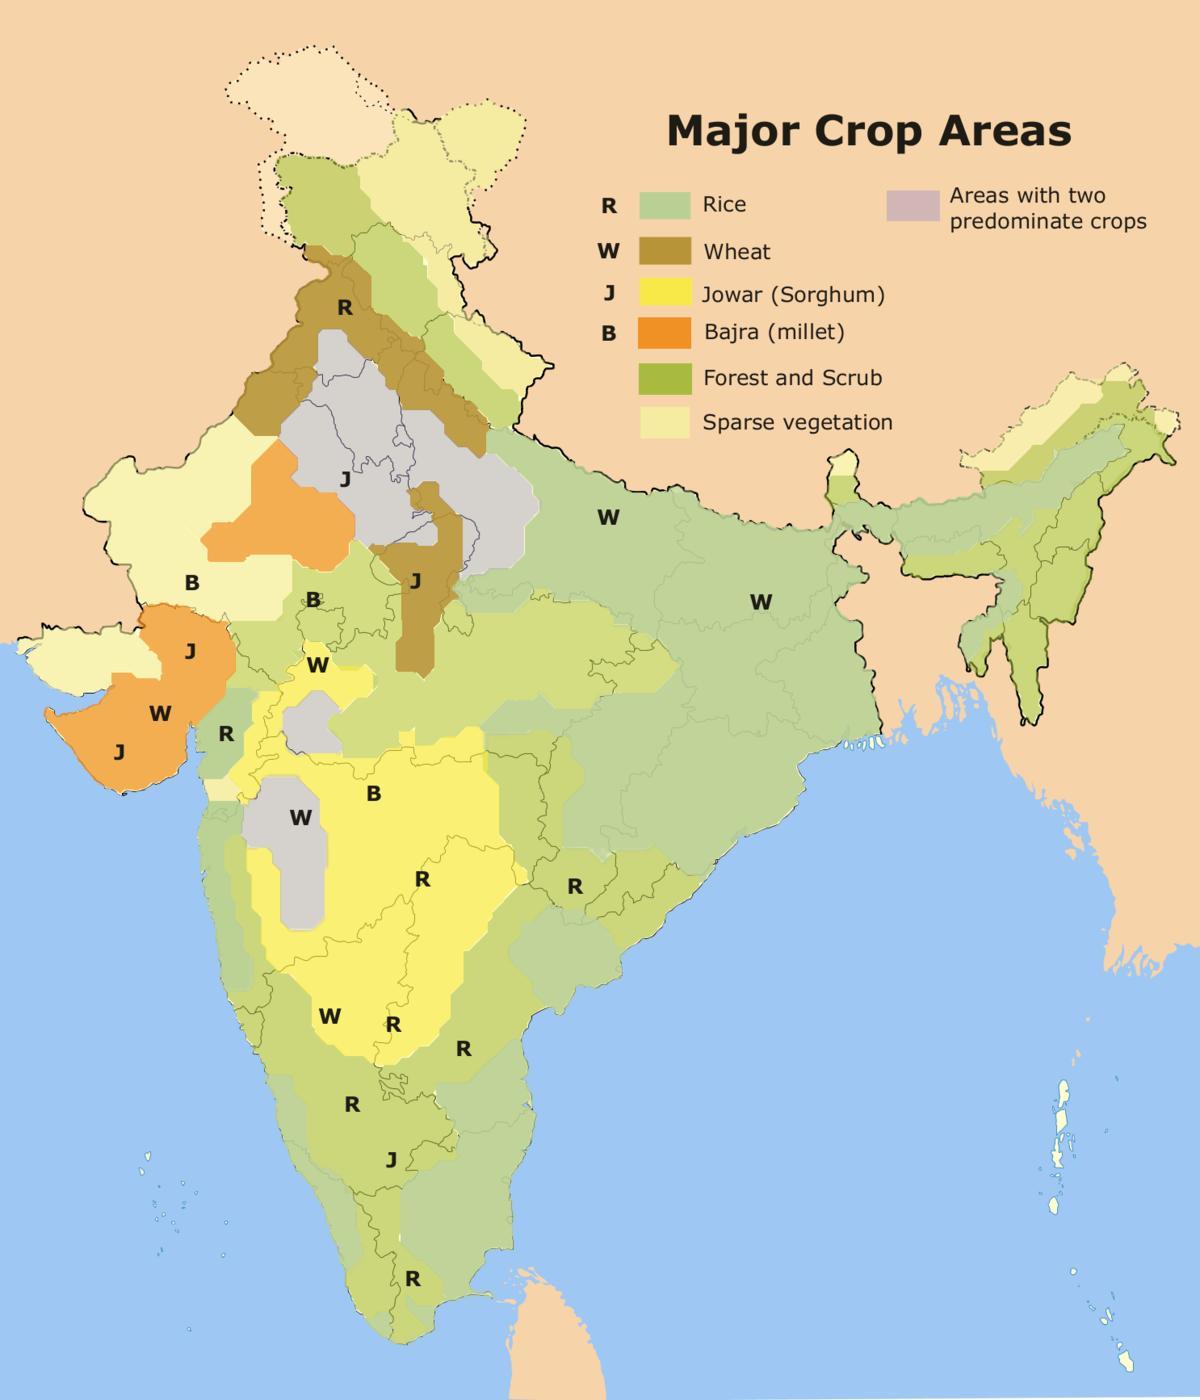 Carte Inde Agriculture.L Agriculture De La Carte De L Inde La Carte De L